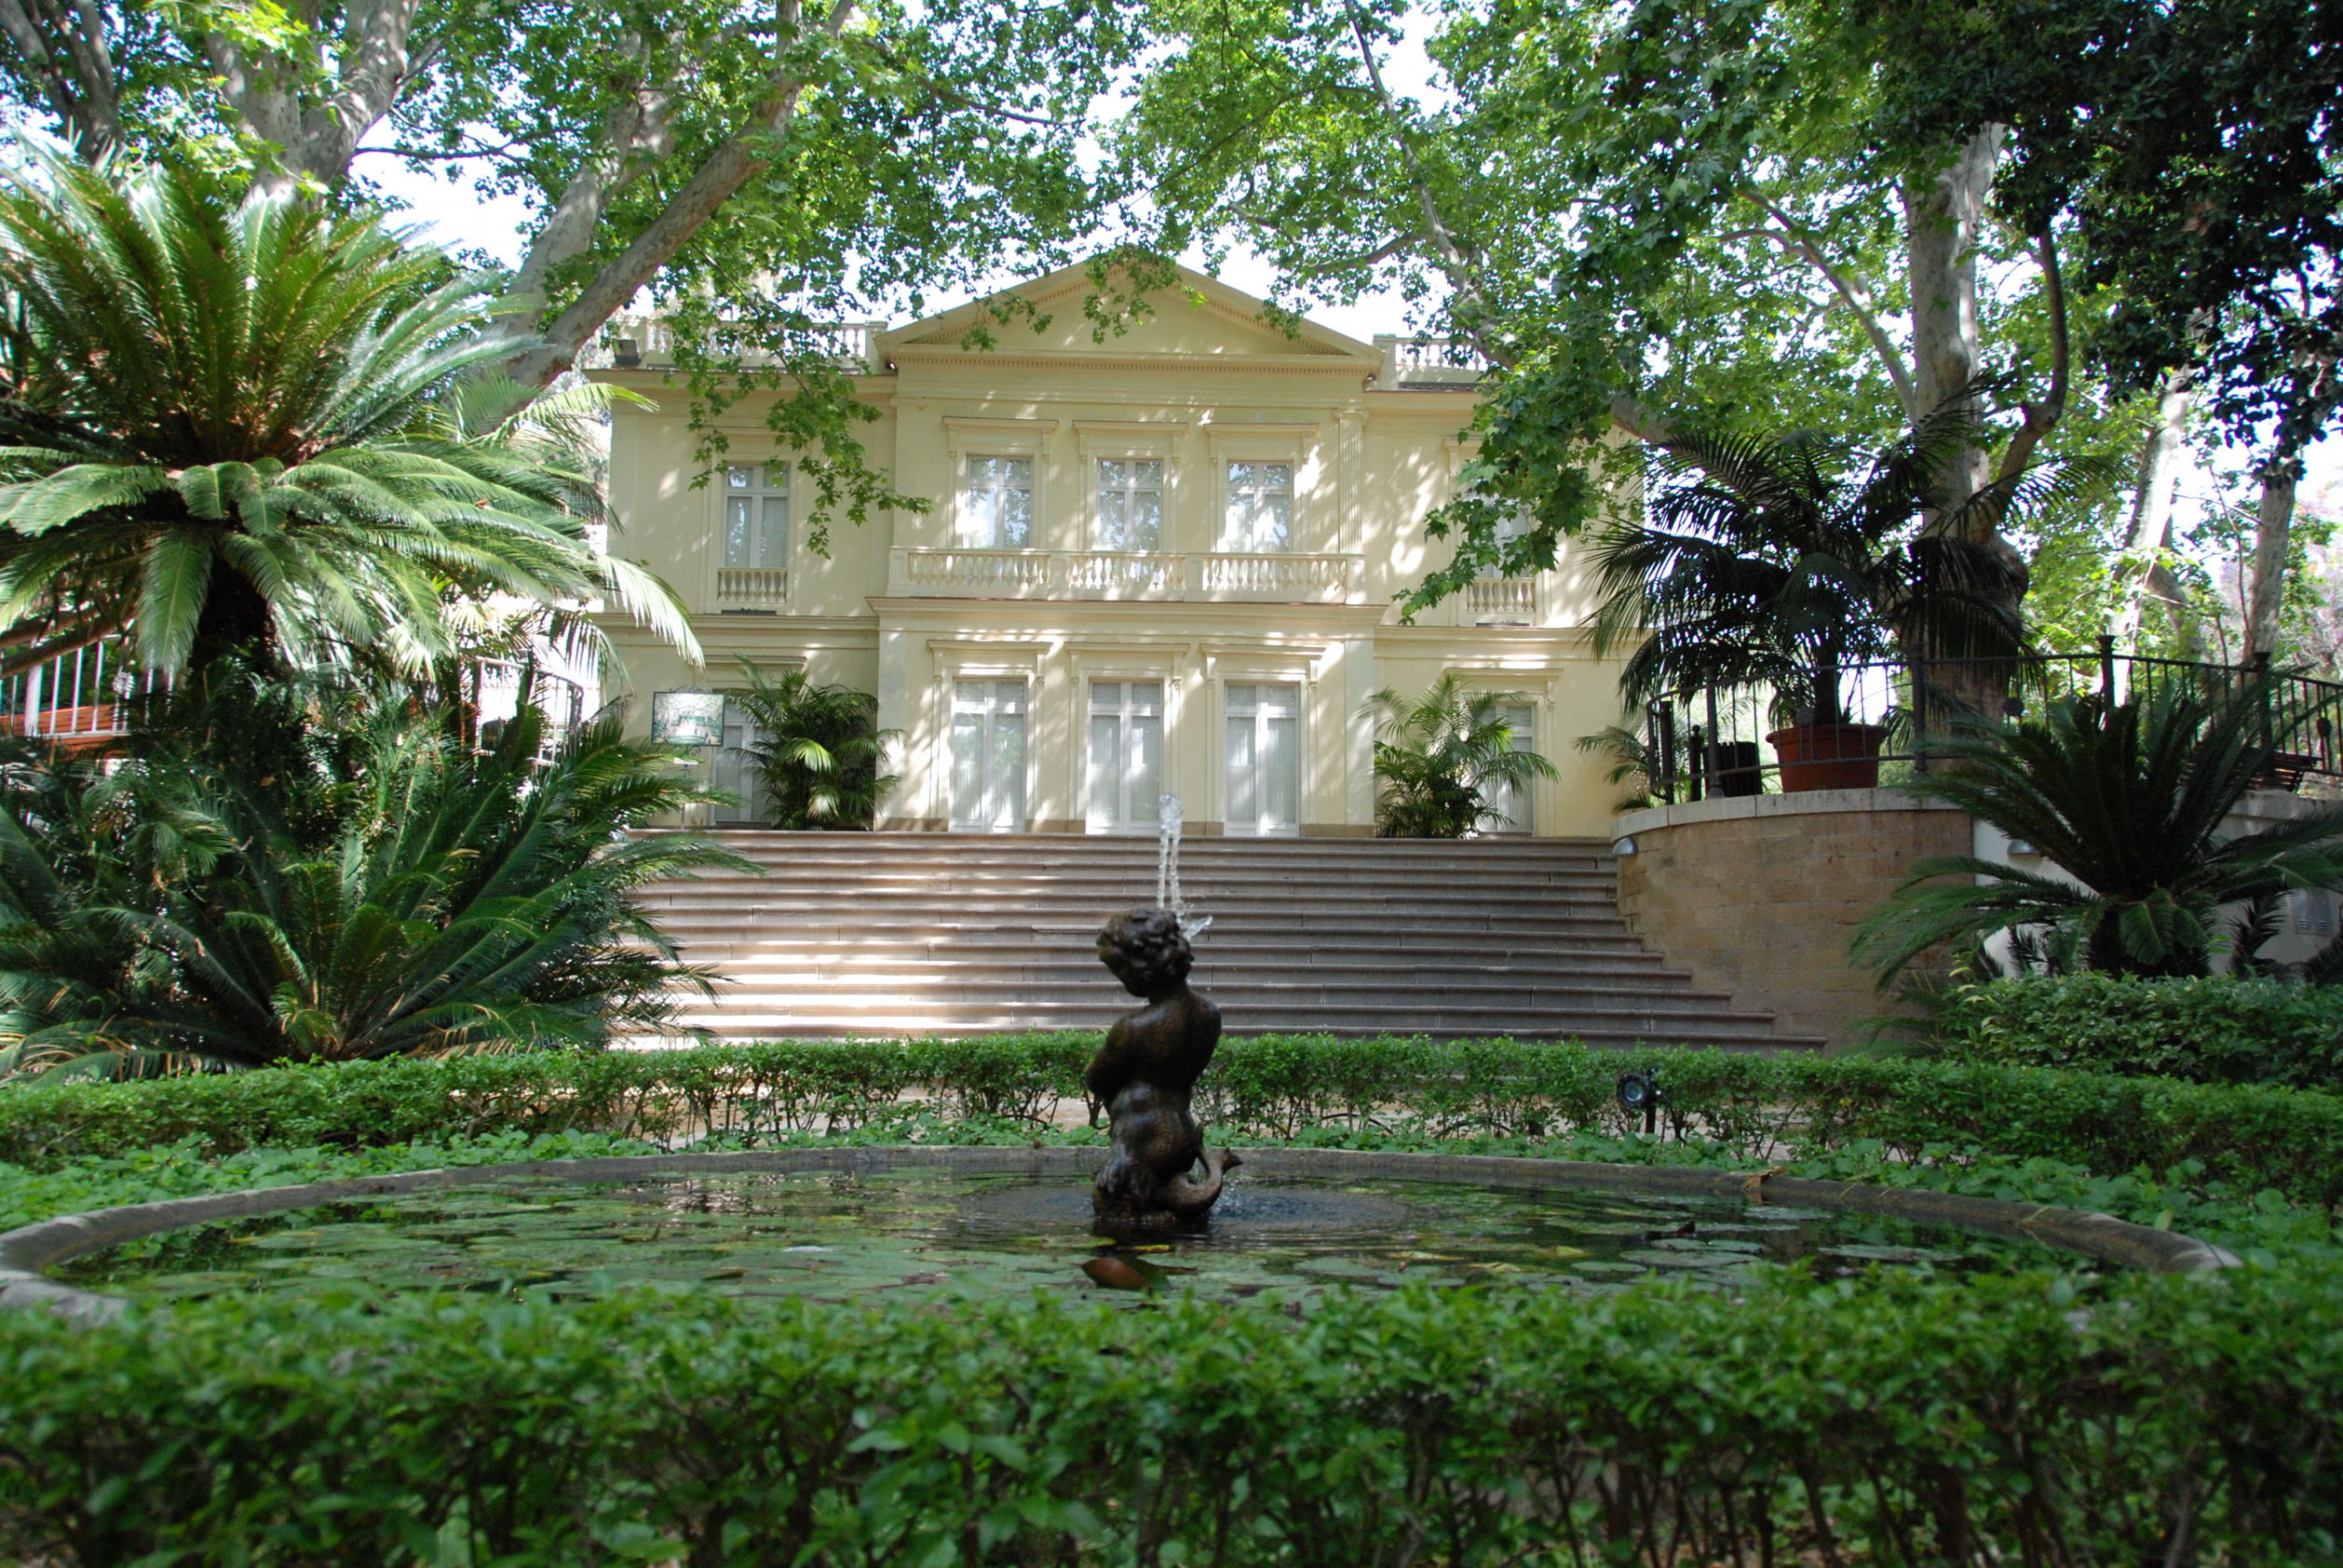 Casa en el jardin botanico fotos de m laga capital for Jardin botanico de malaga